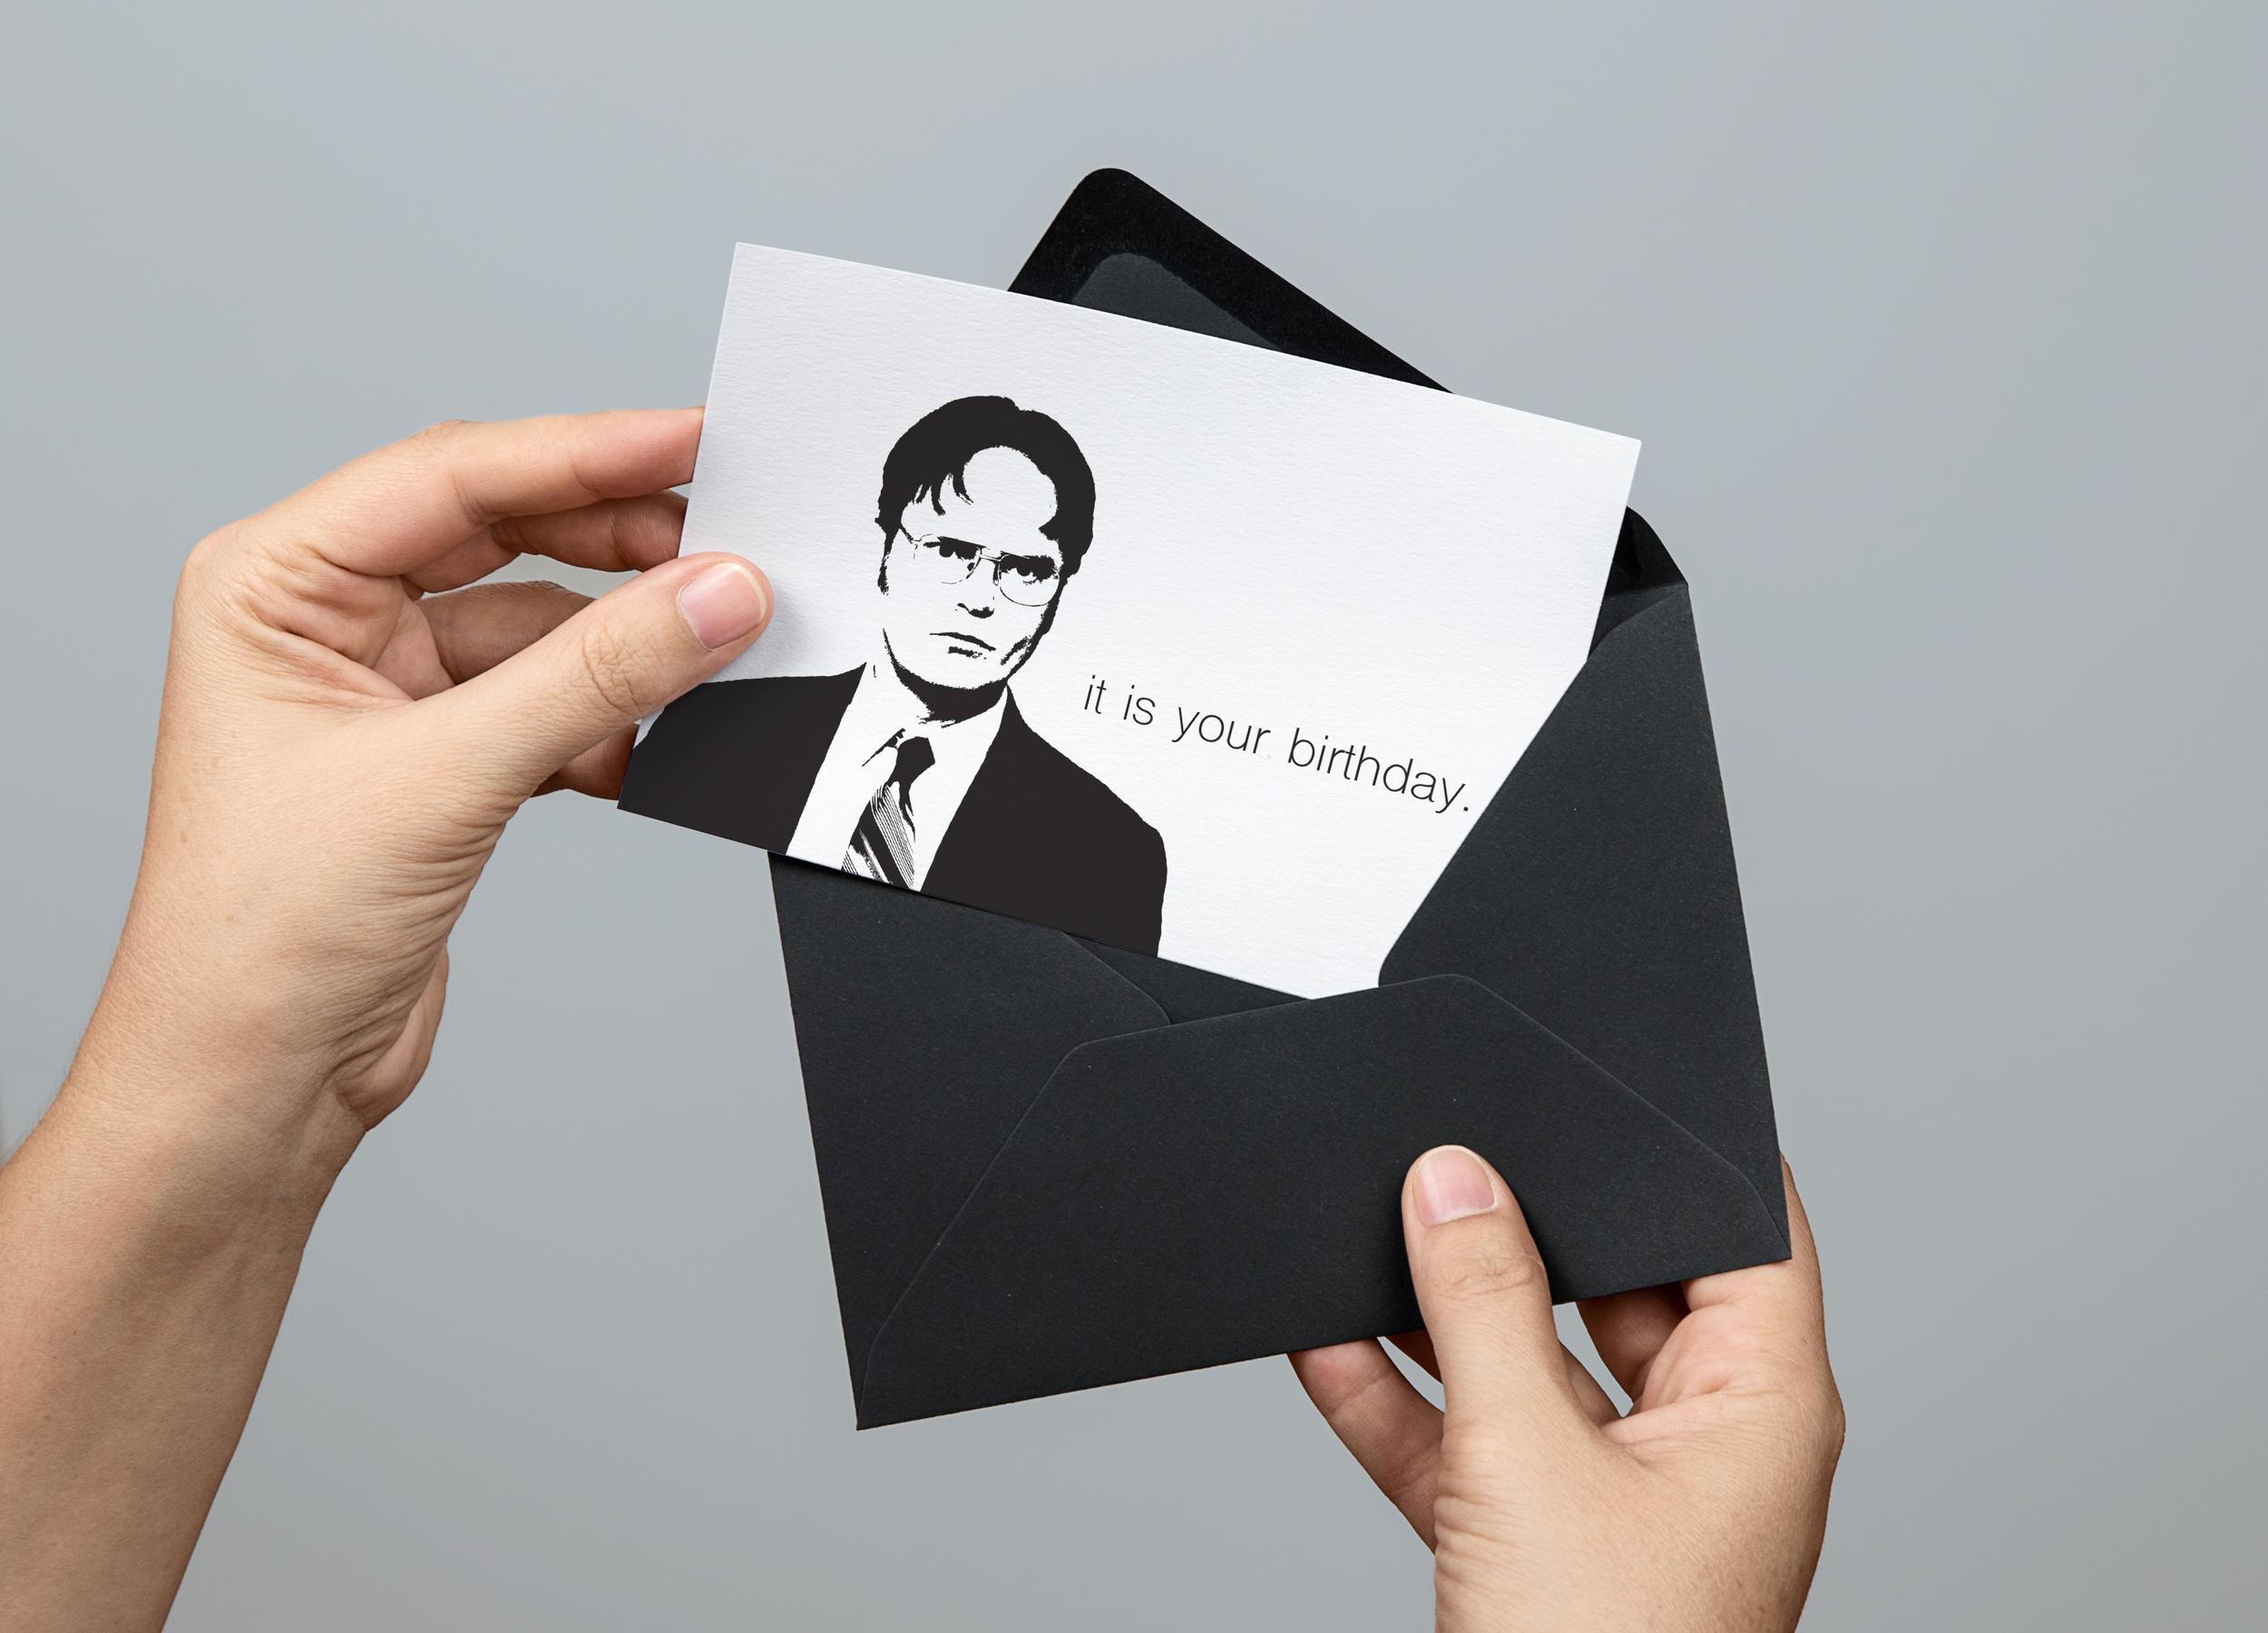 Dwight_mockup.jpg